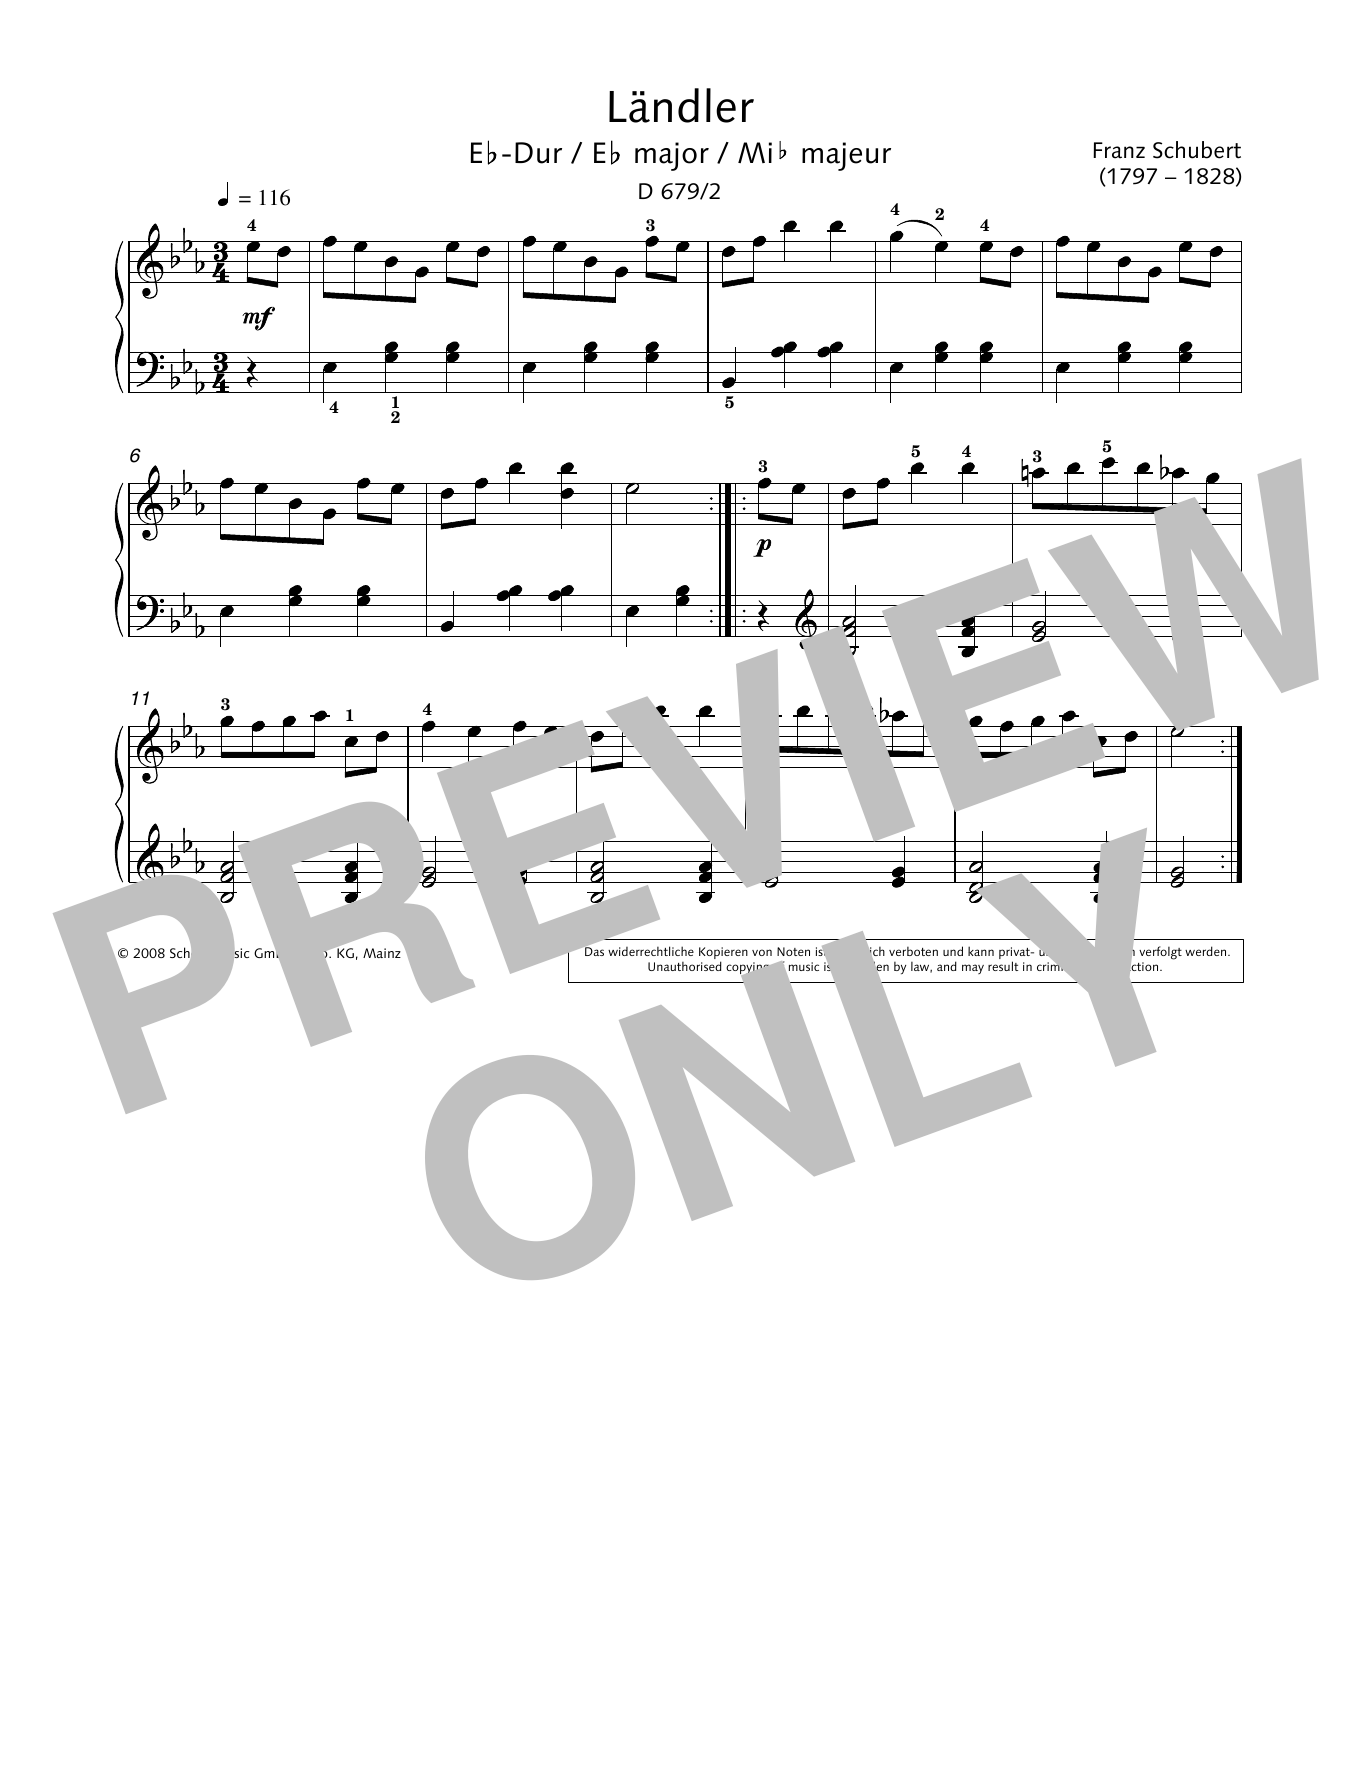 Ländler in E-flat major Sheet Music